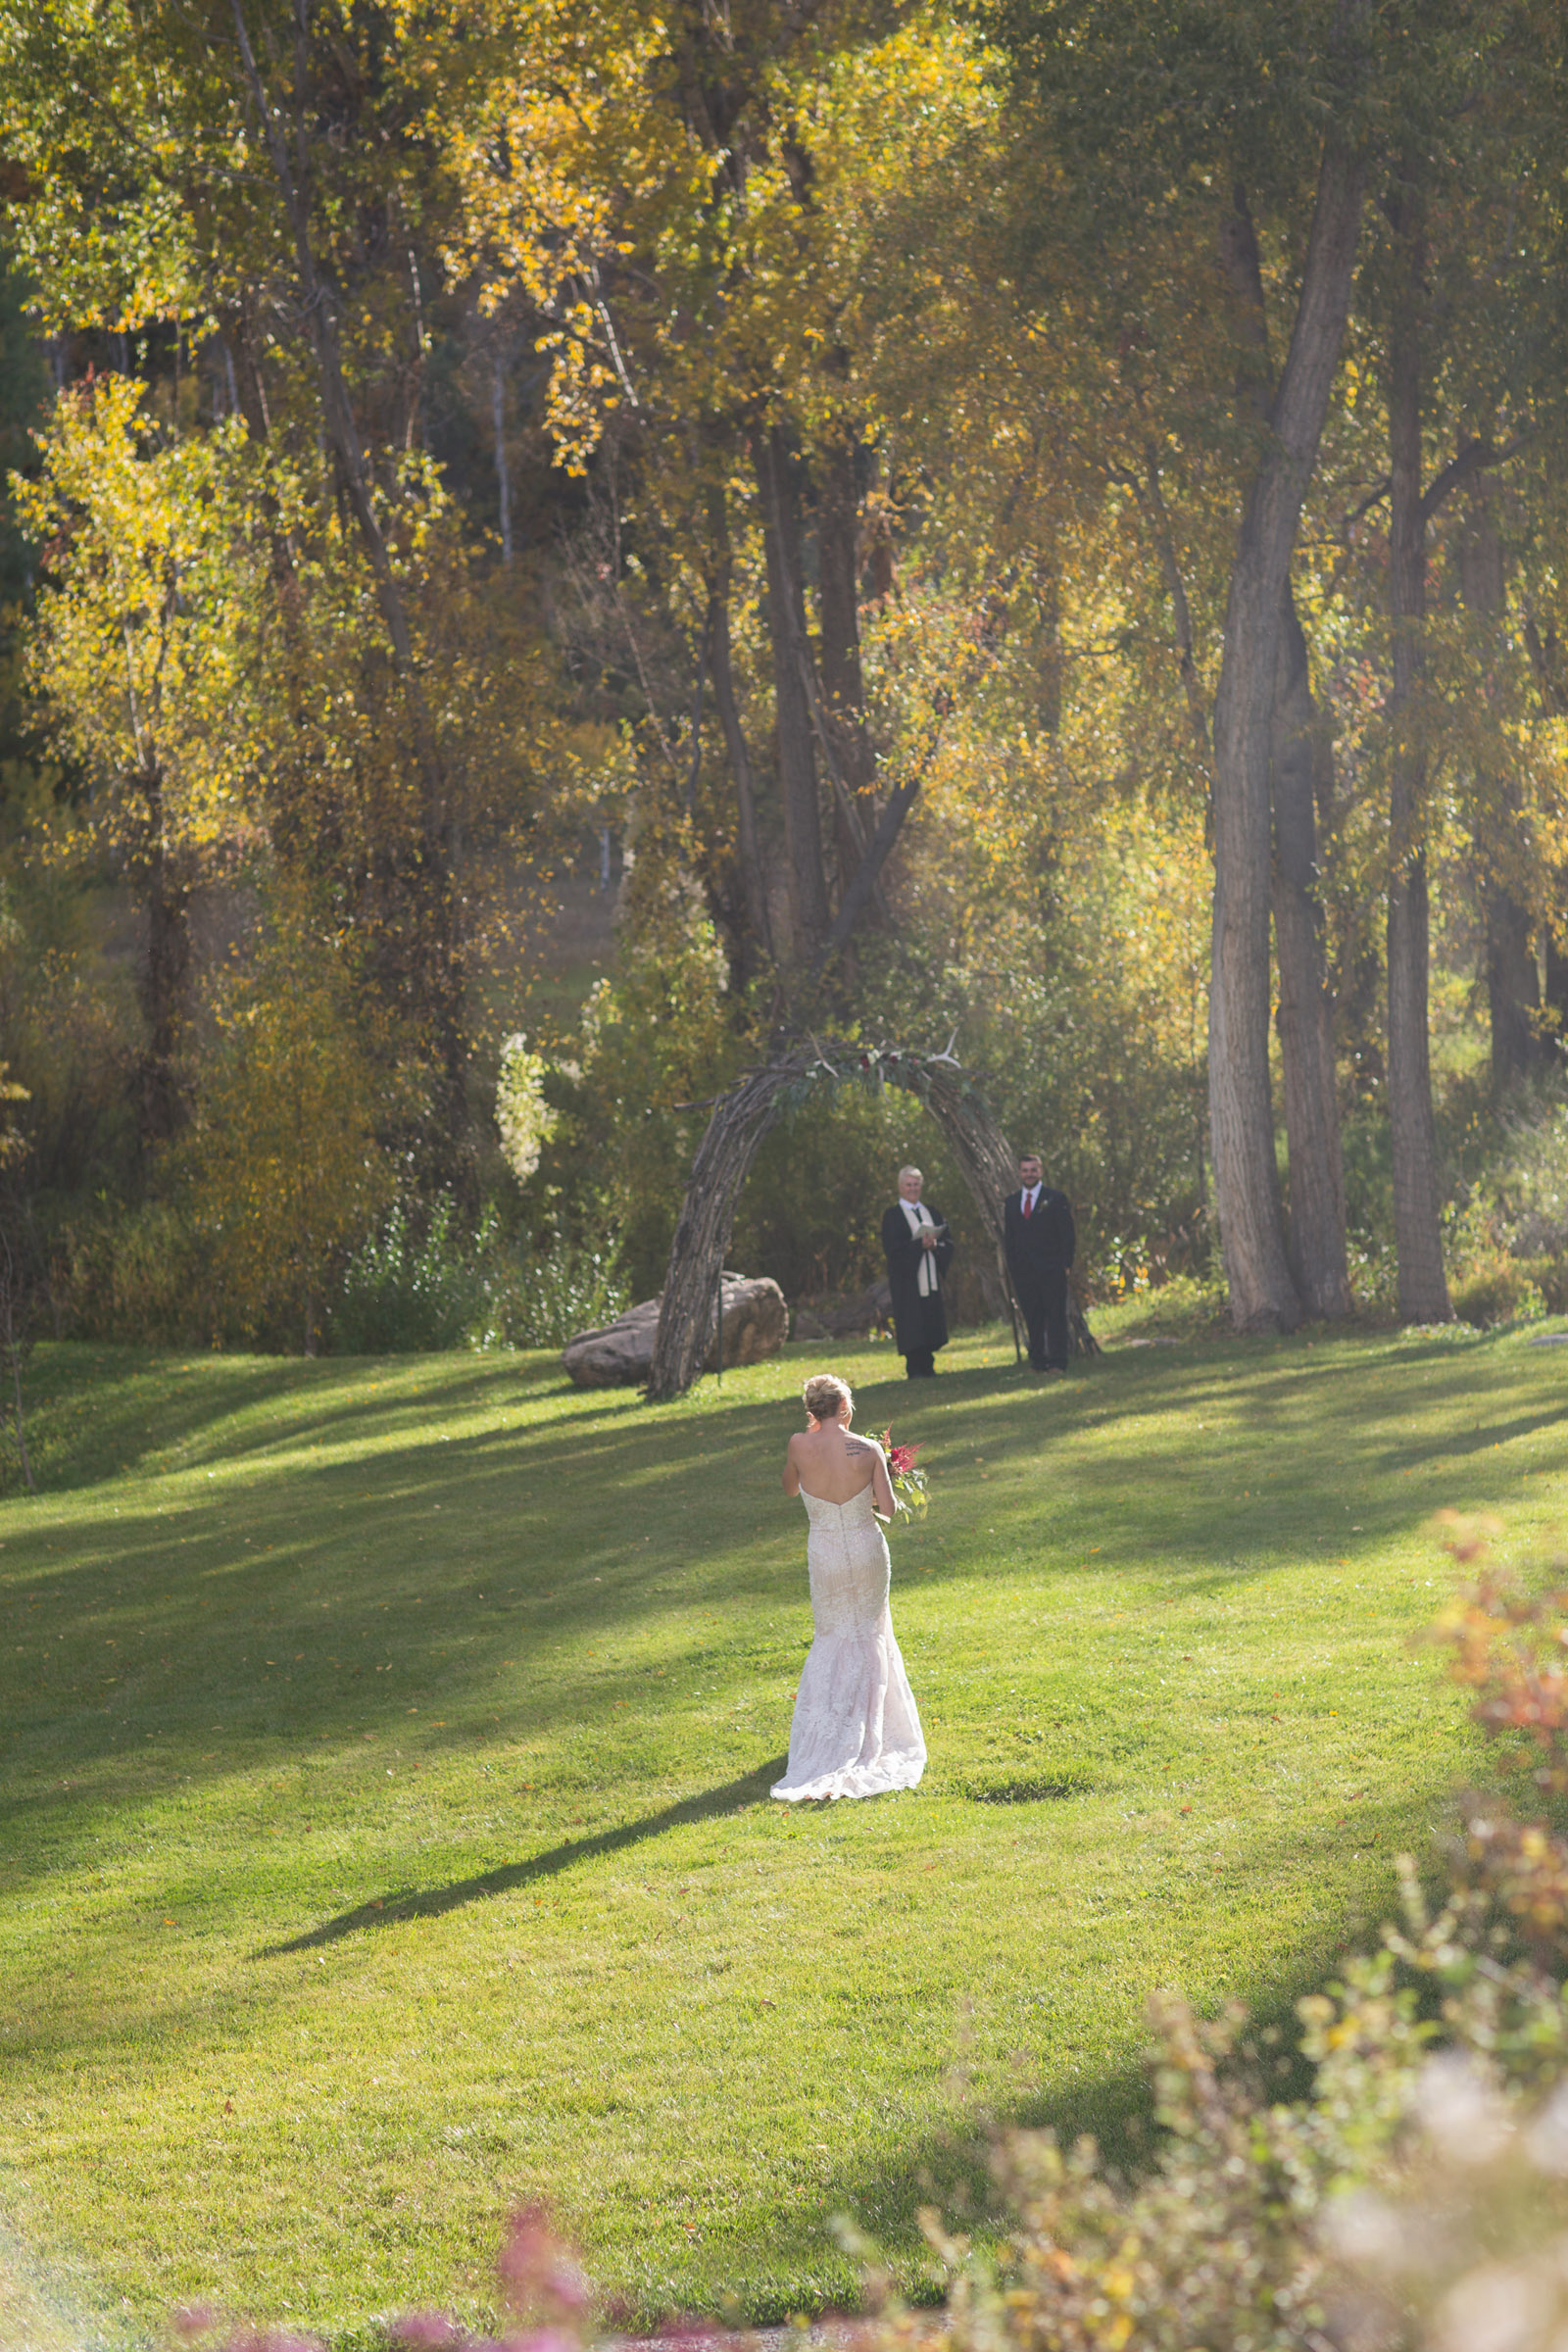 059-groom-smiling-at-bride-during-private-elopement-wedding-ceremony-in-durango-colorado